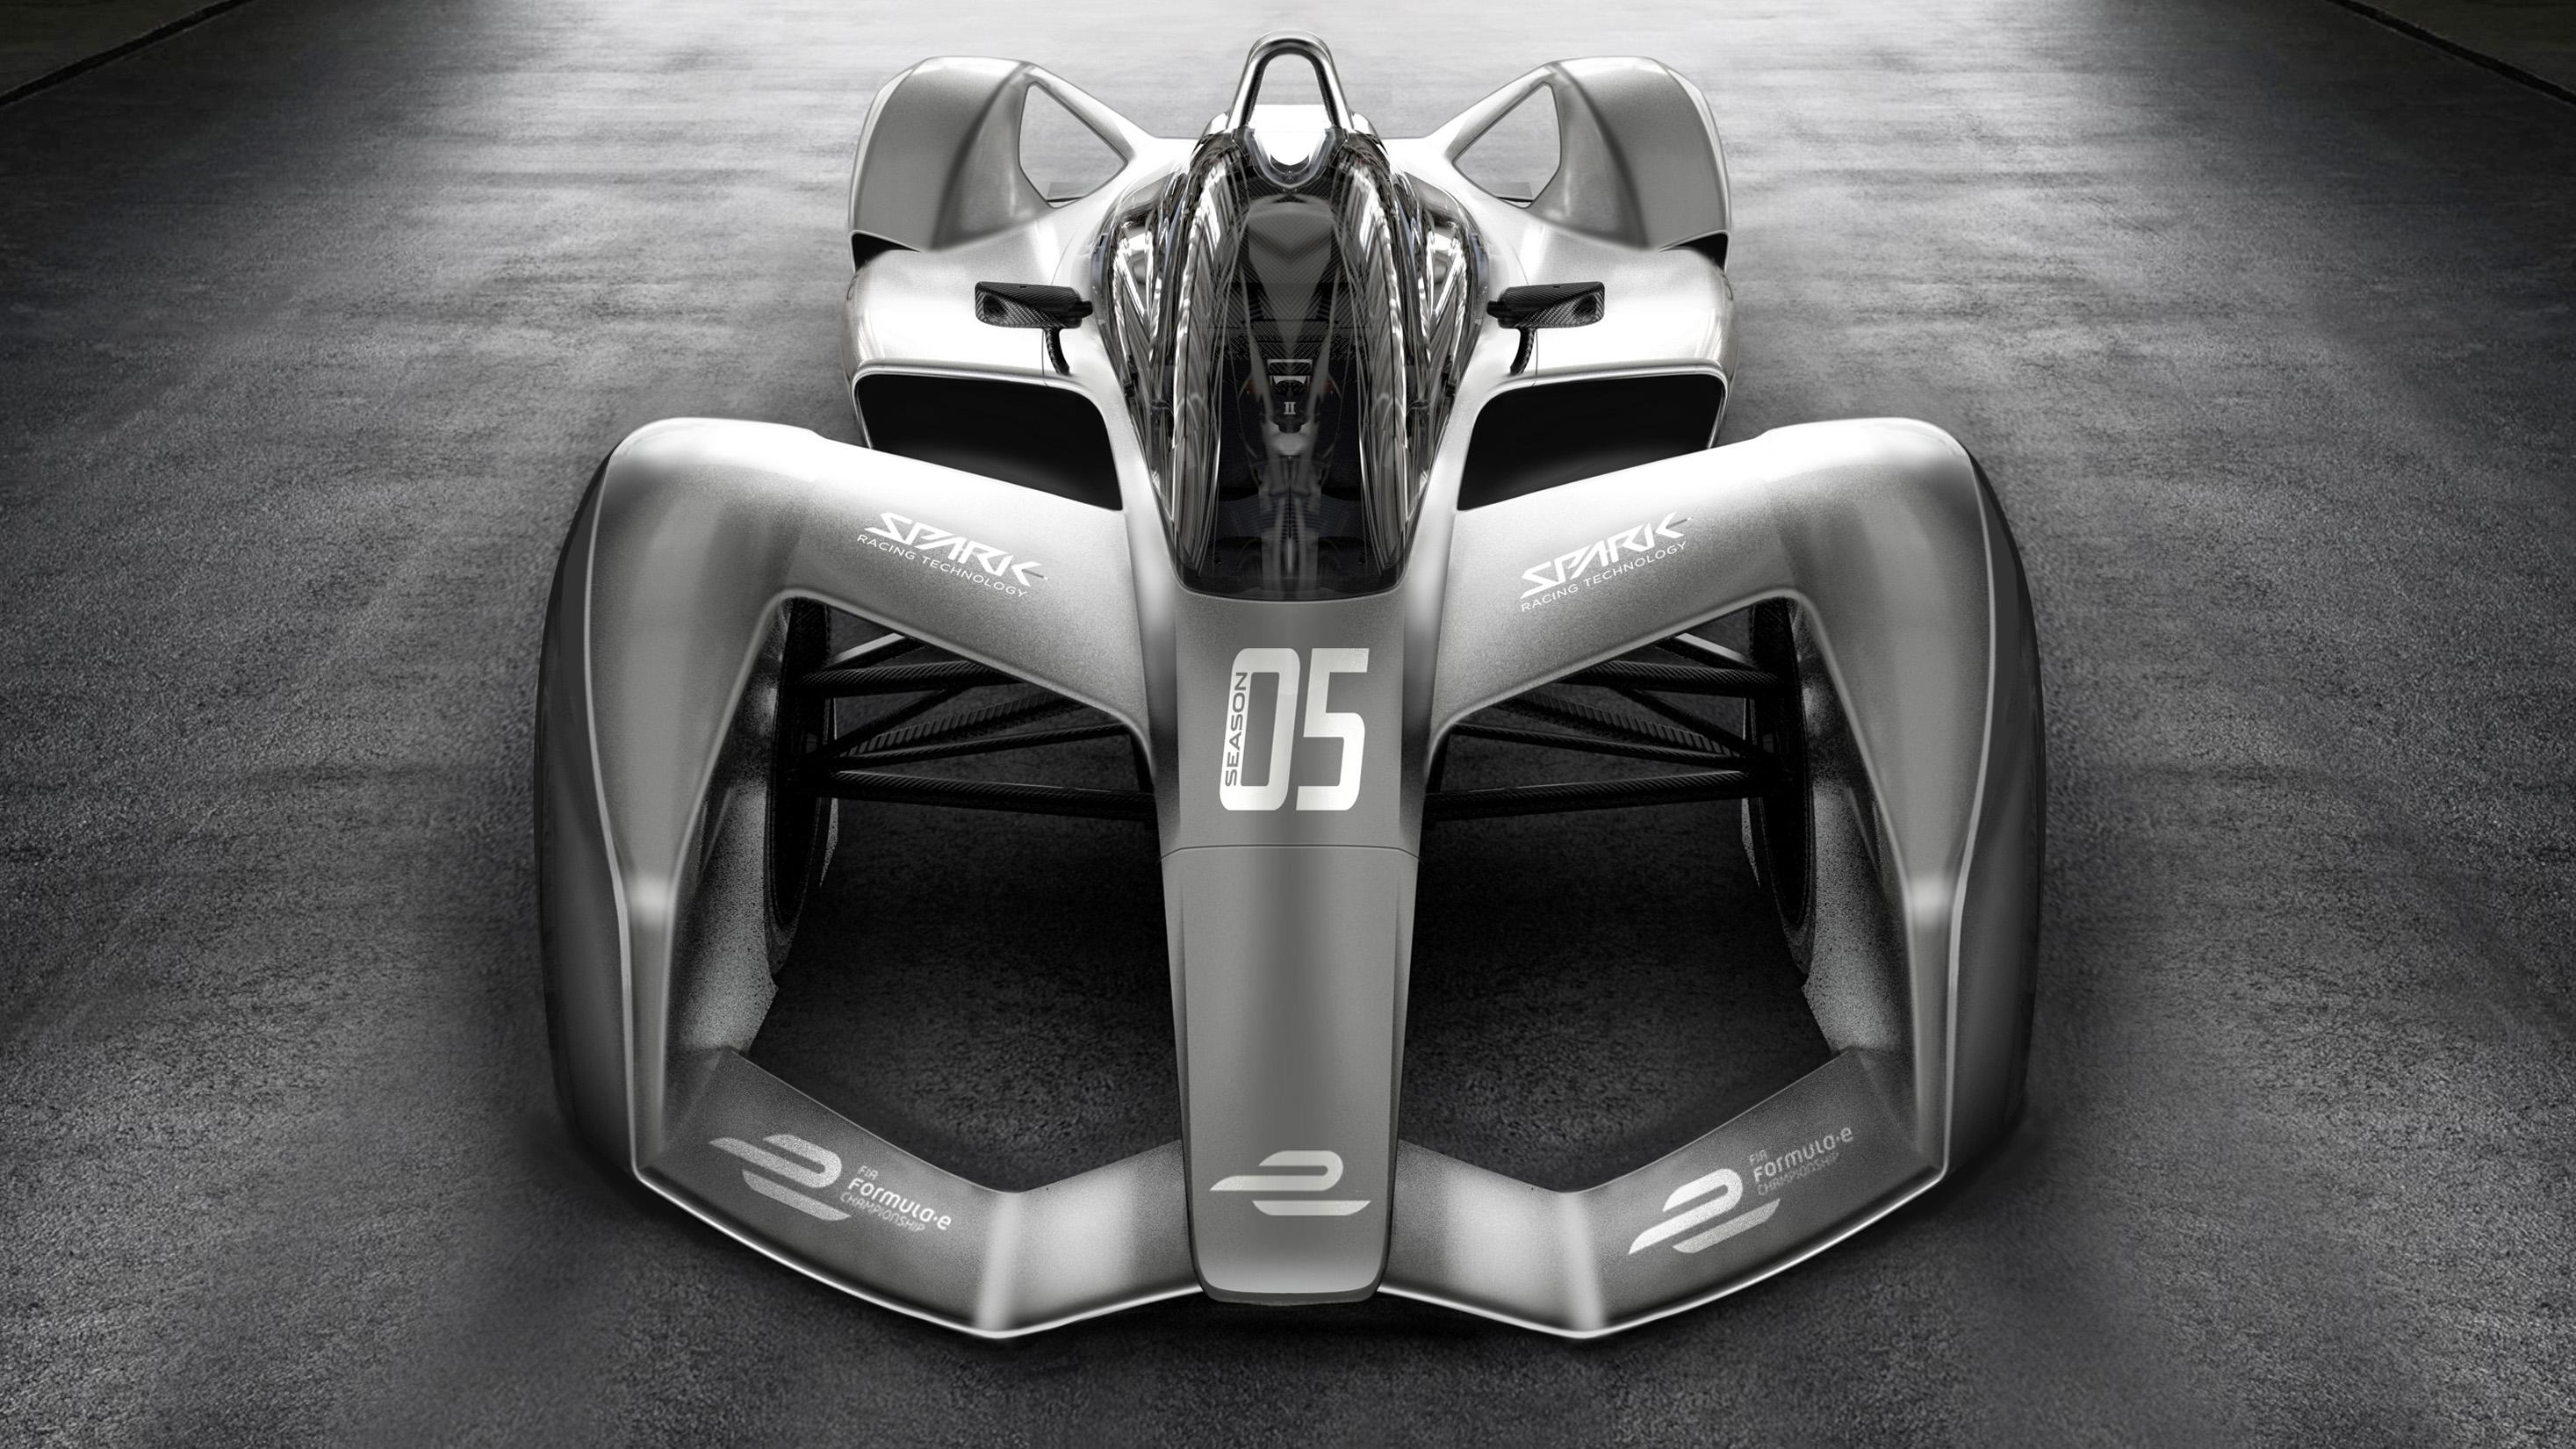 new concept images show just how crazy formula e u0027s race cars will